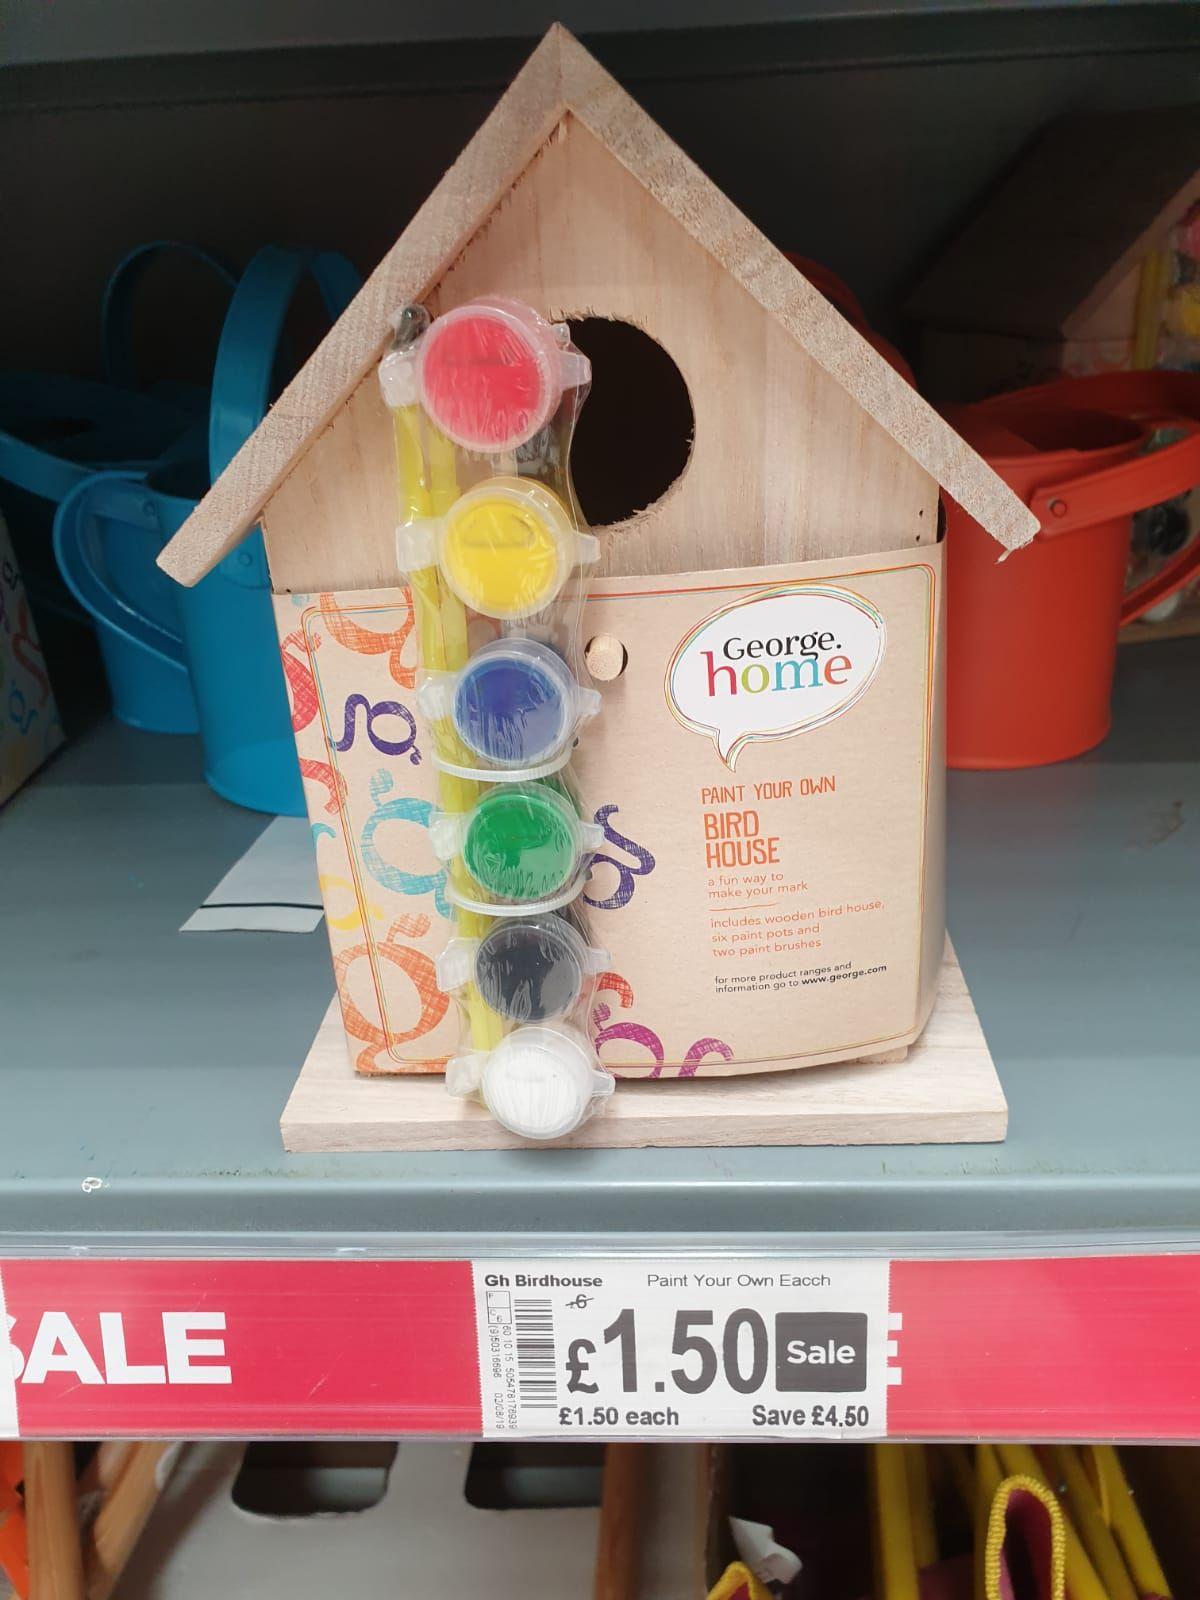 George Home birdhouse was £6 now £1.50 @ Asda clydebank